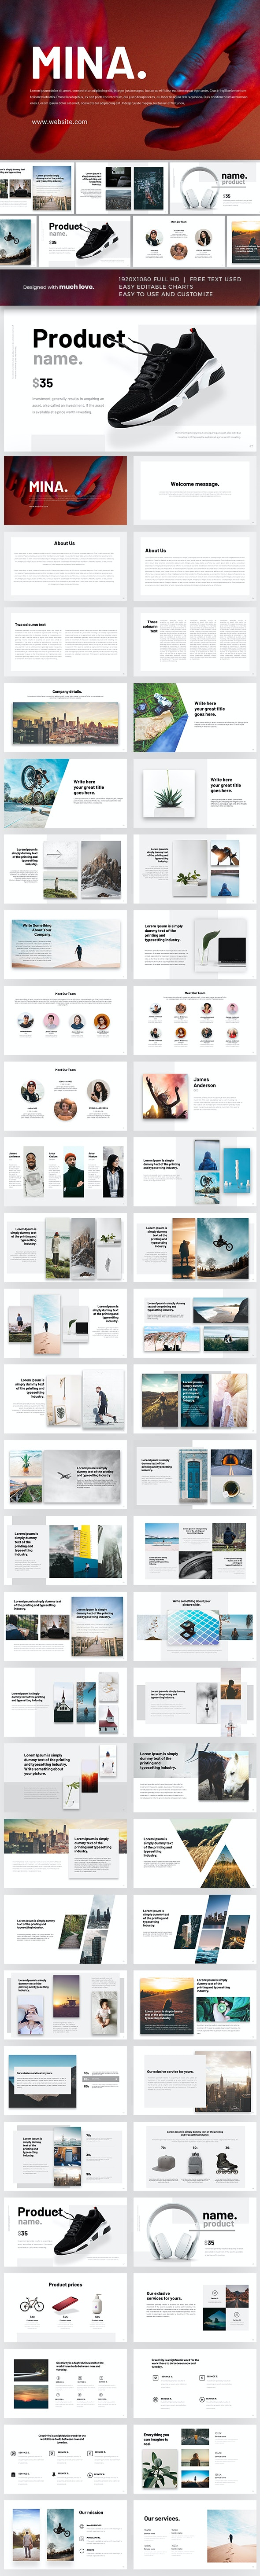 Mina Powerpoint Presentation Template by Azad_Sultanov